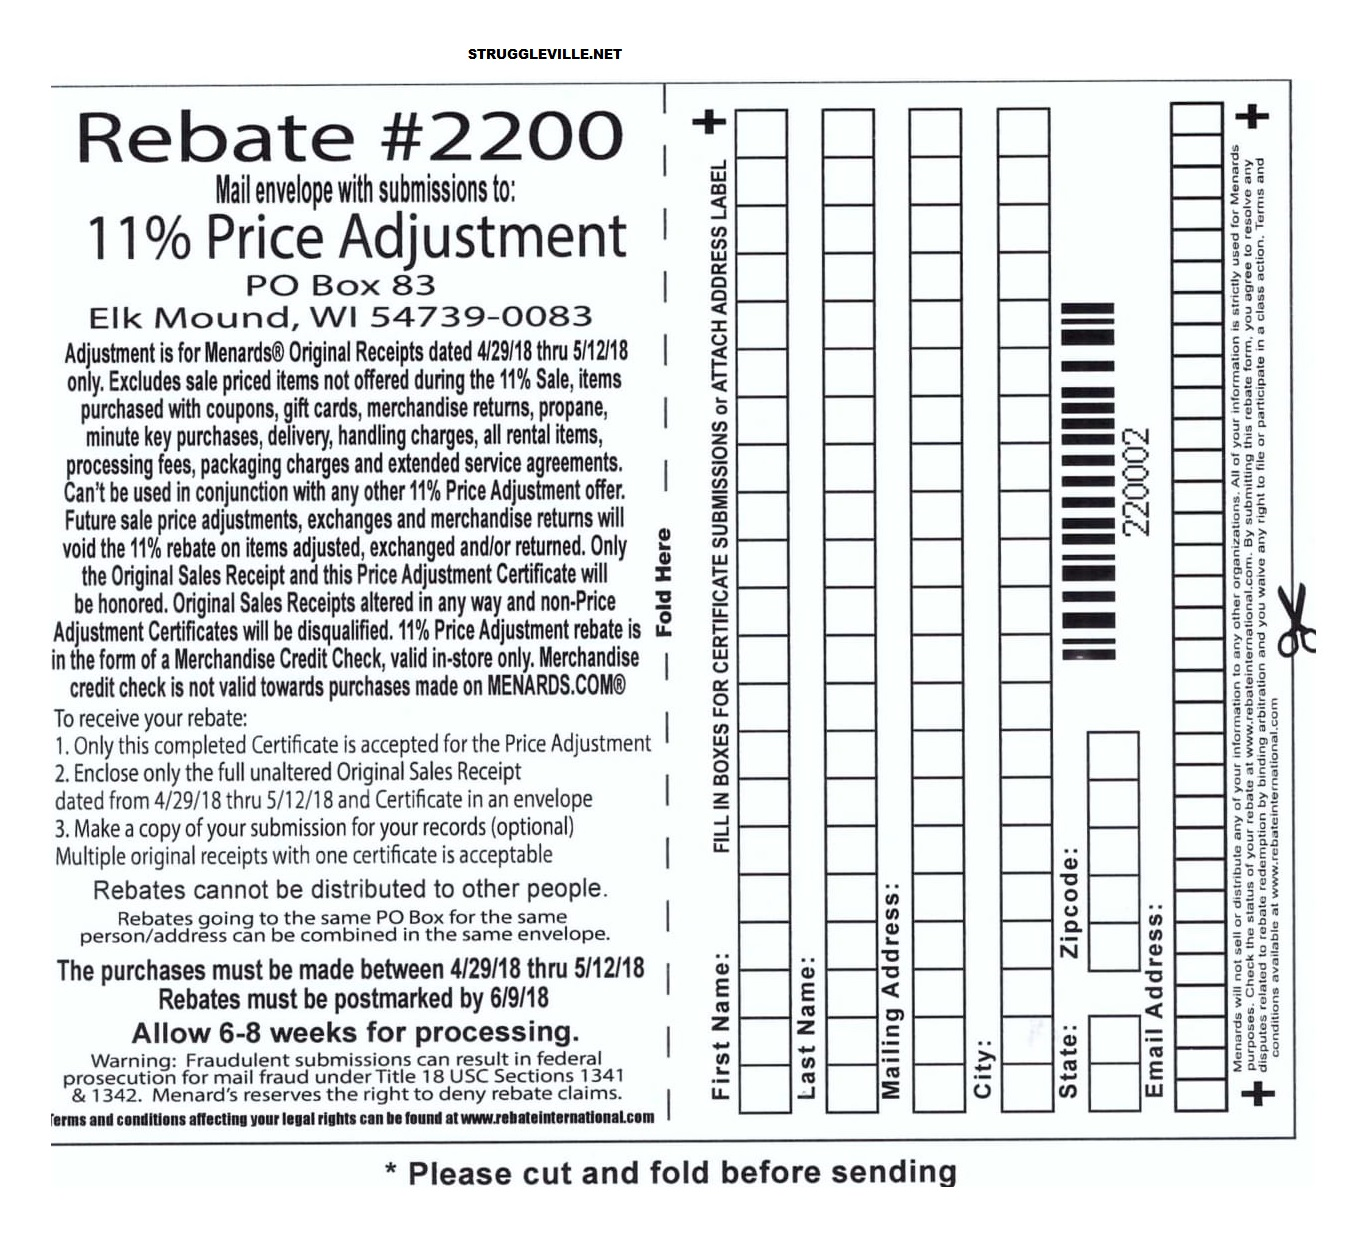 Menards 11% Price Adjustment Rebate #2200 – Purchases 4/29/18-5/12